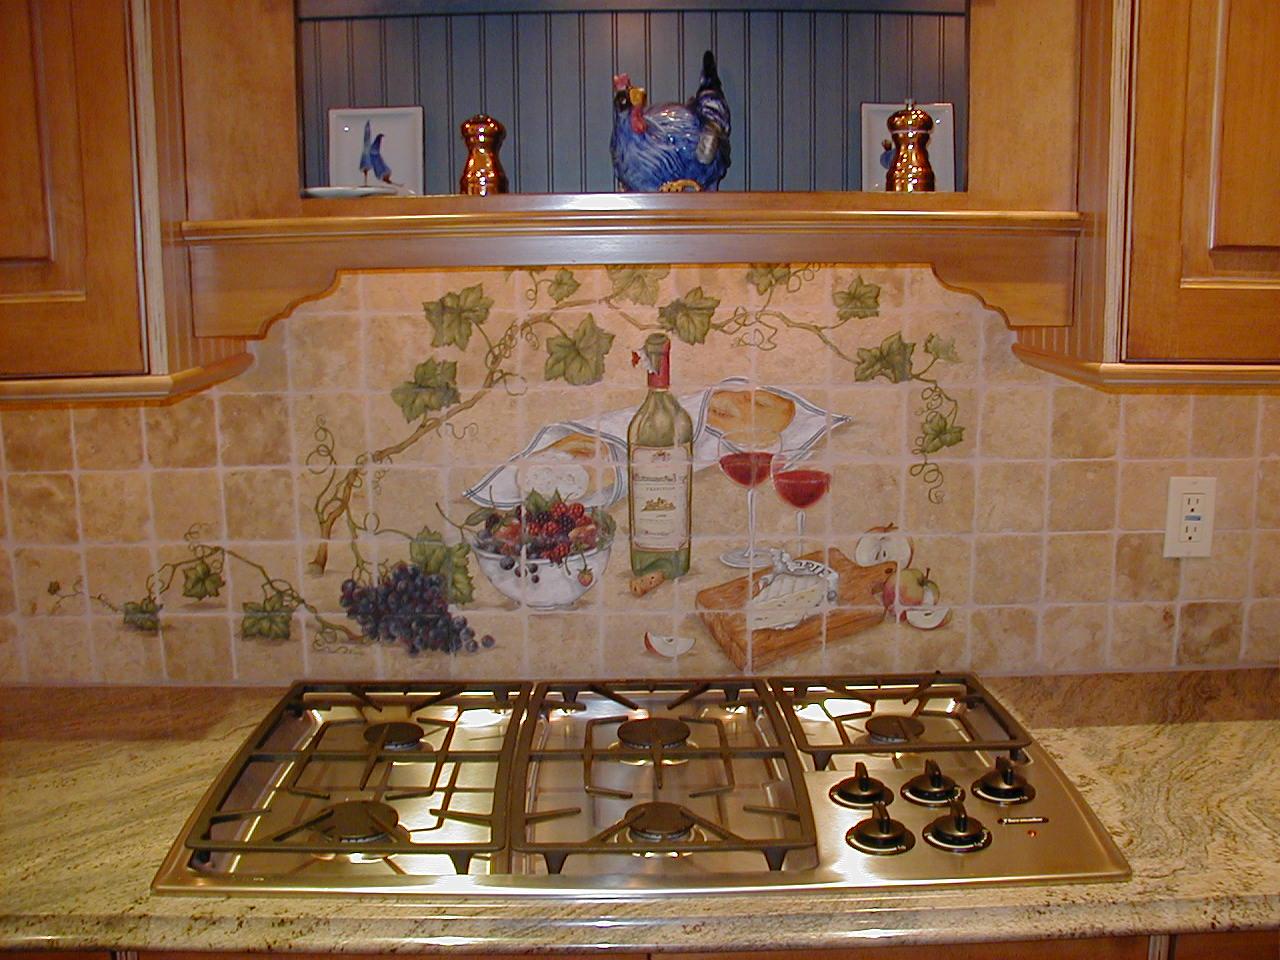 Picasa - Custom painted cooktop backsplash mural.jpg